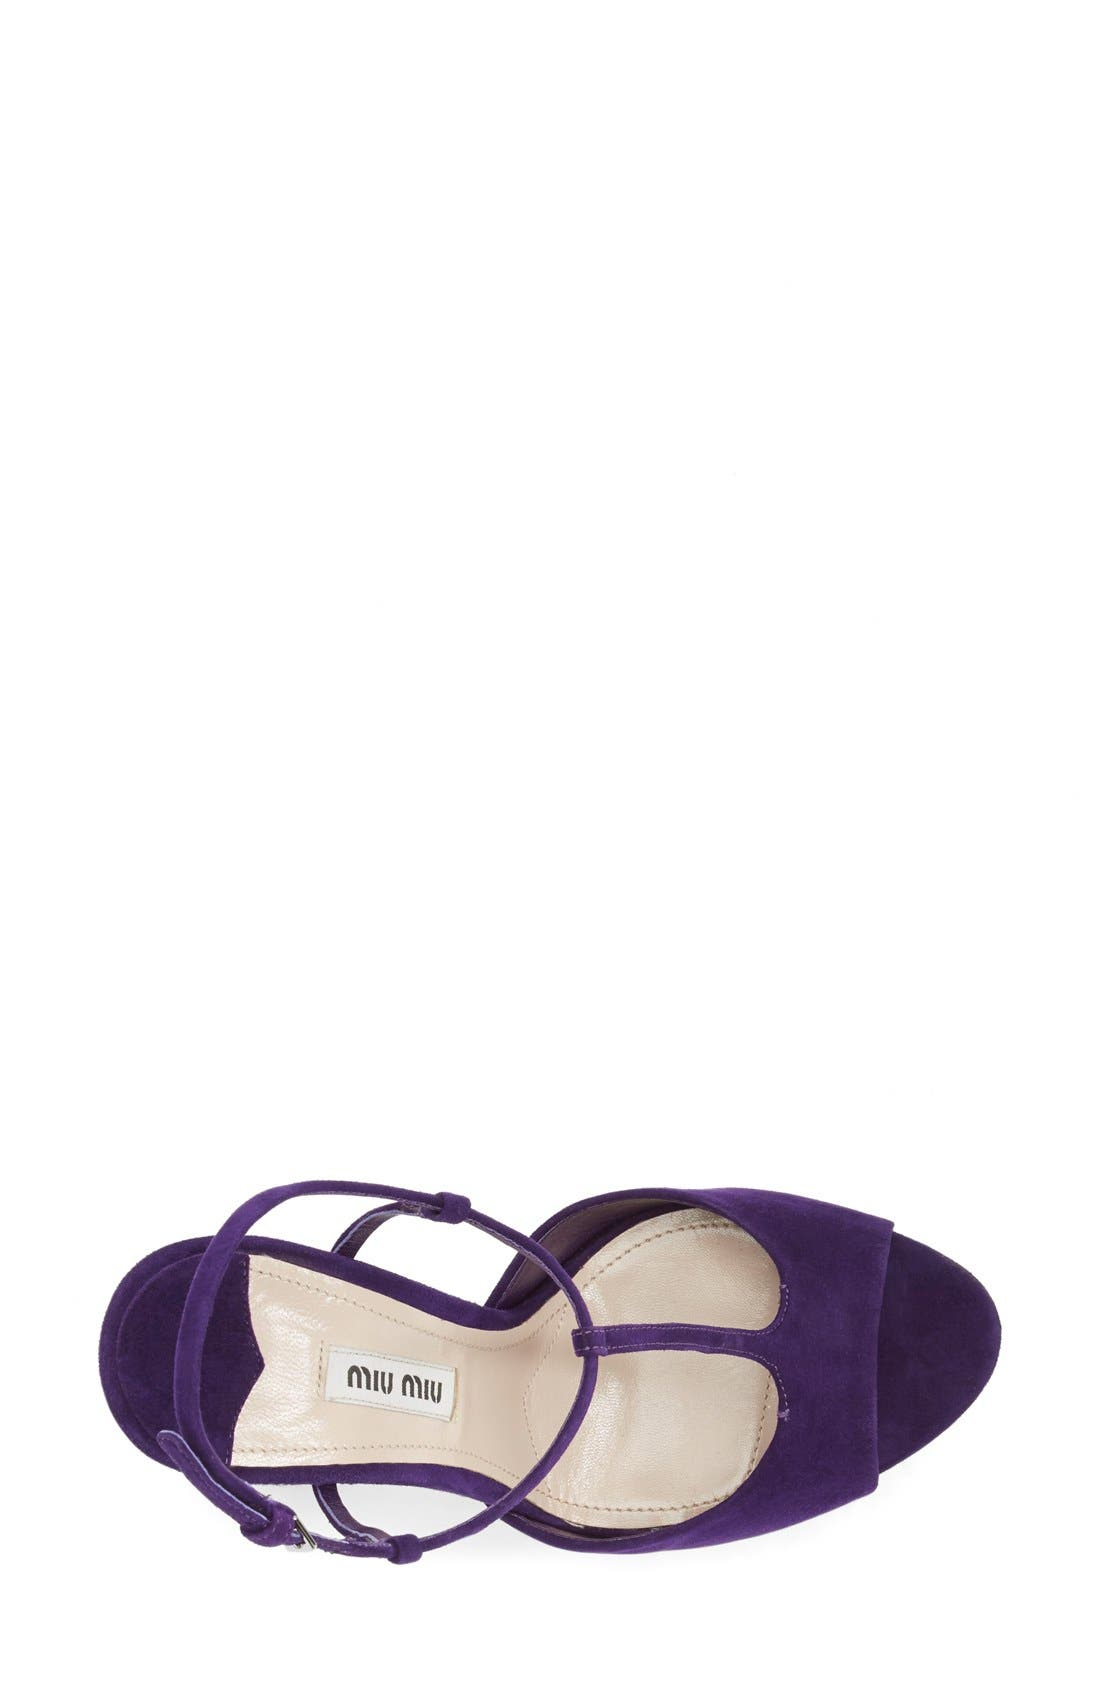 Alternate Image 3  - Miu Miu Mary Jane Platform Sandal (Women)